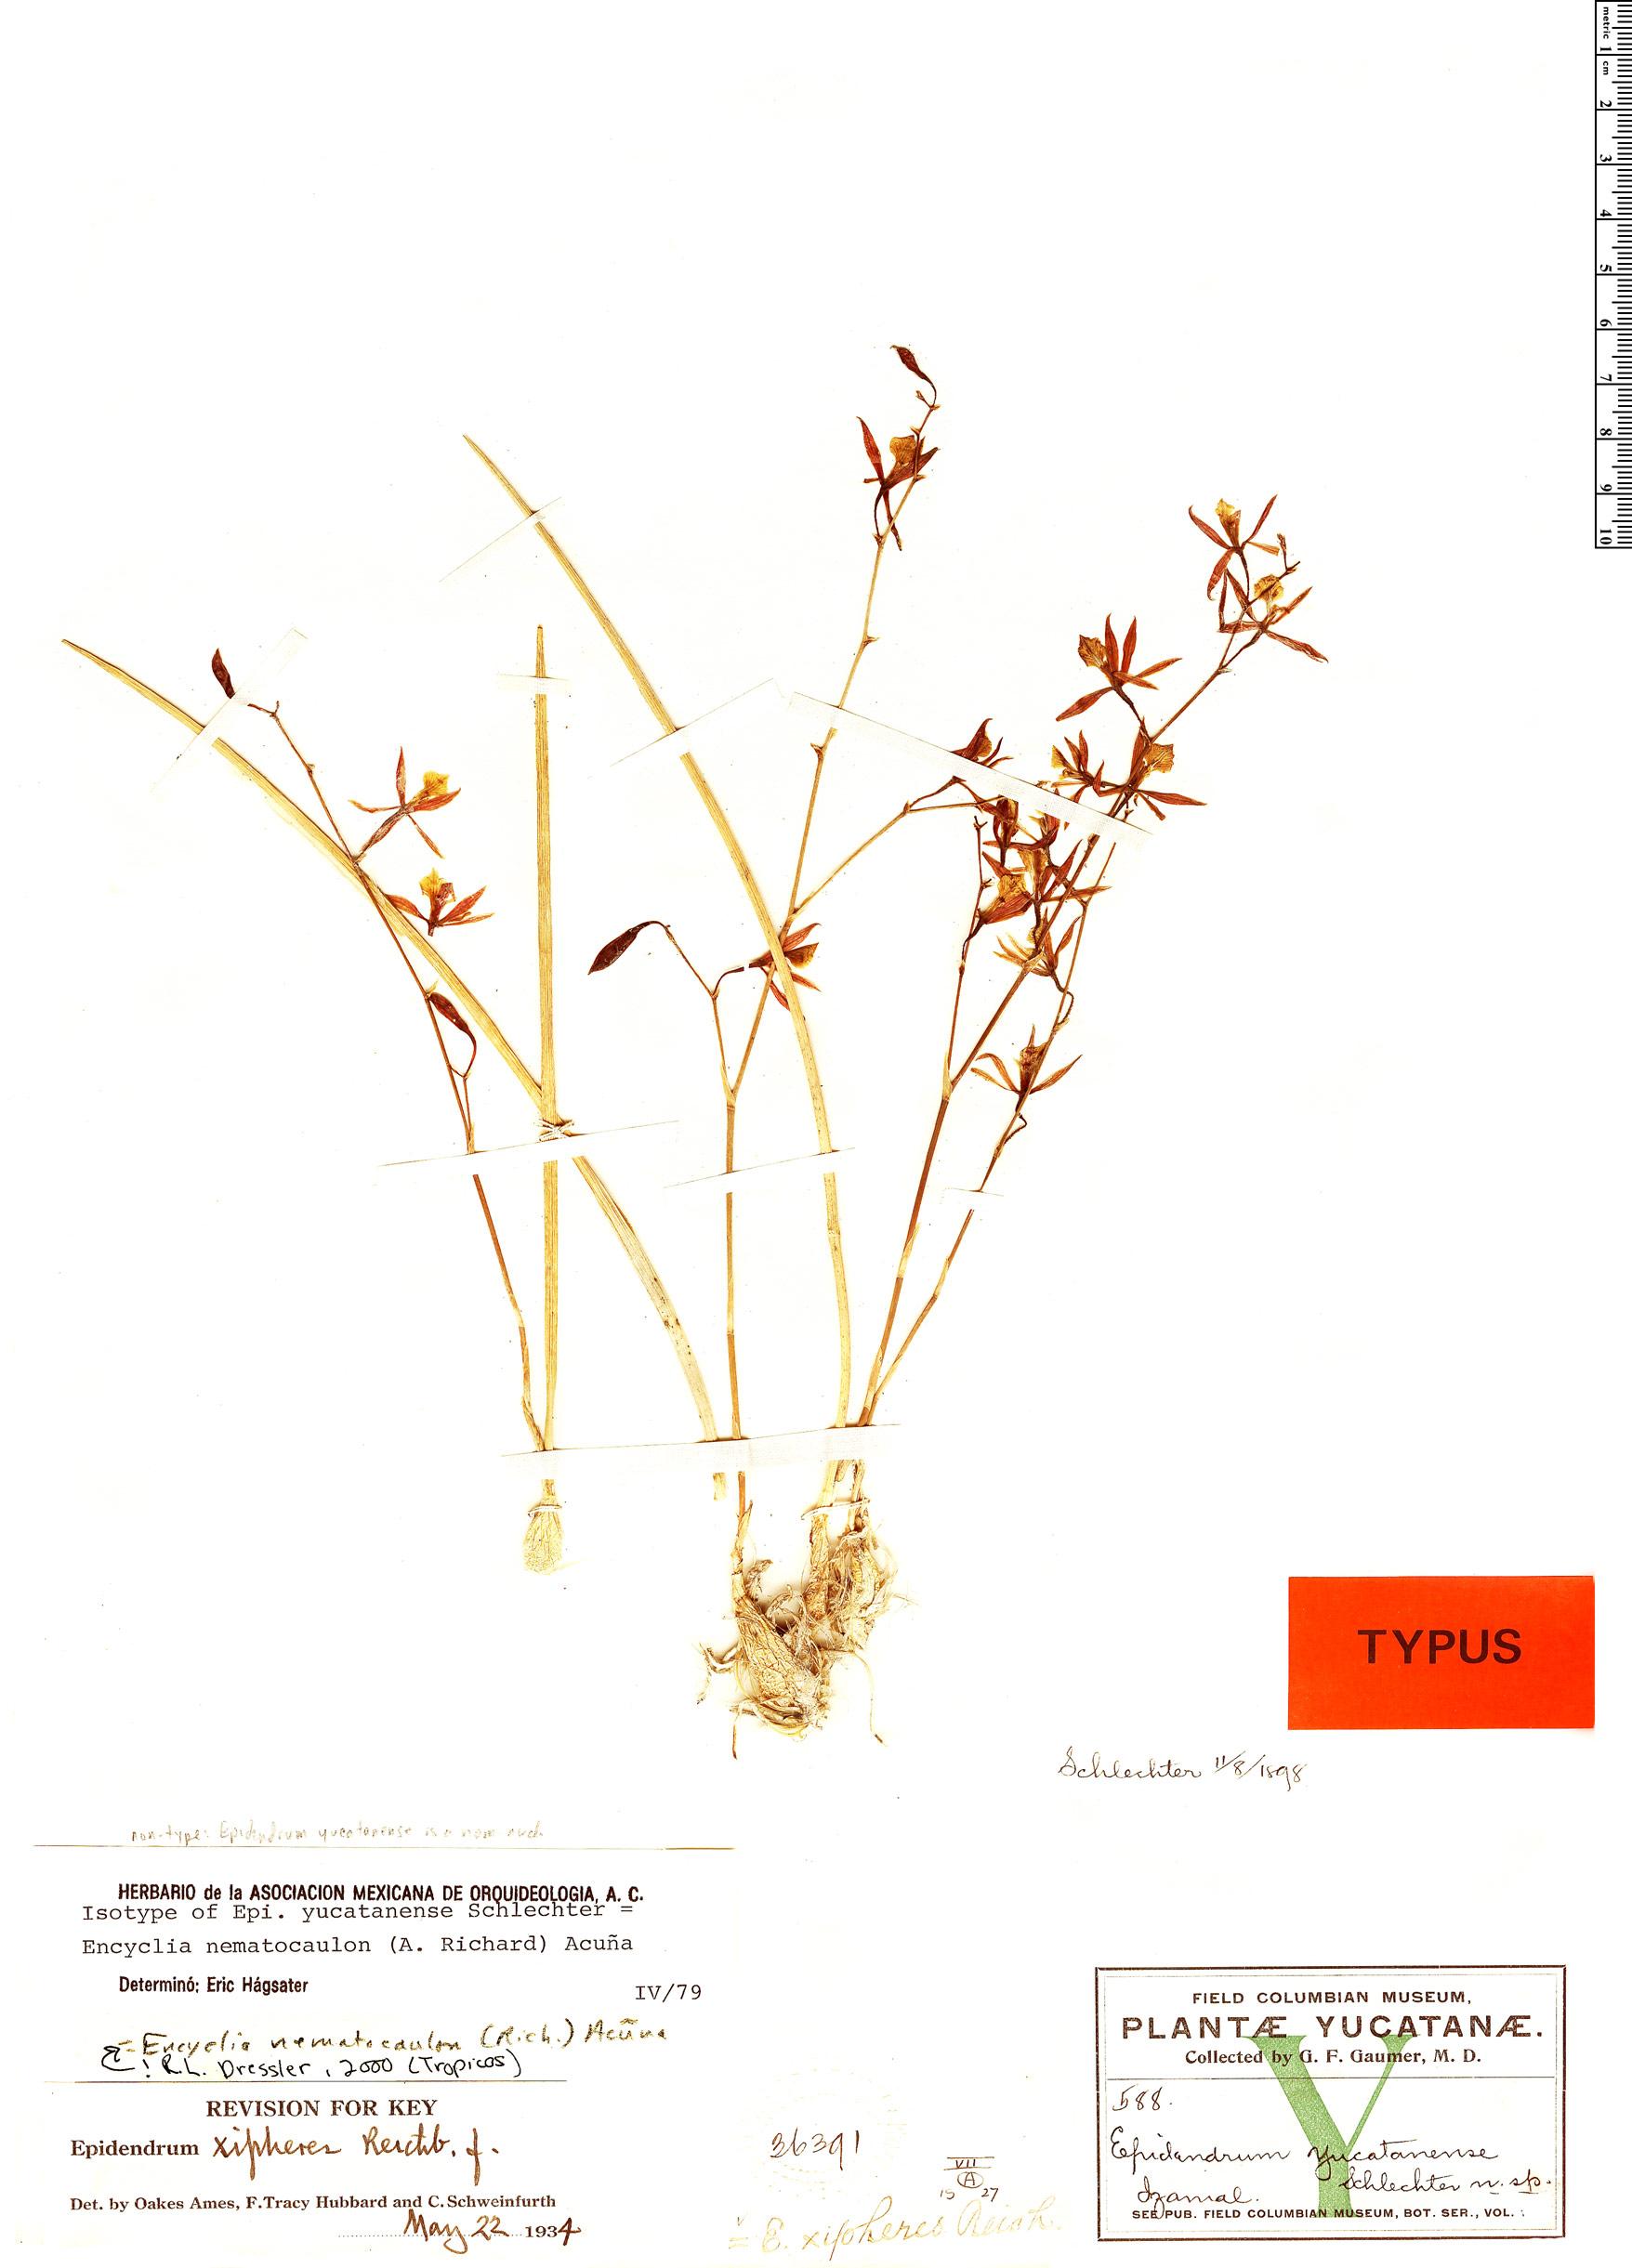 Specimen: Encyclia nematocaulon